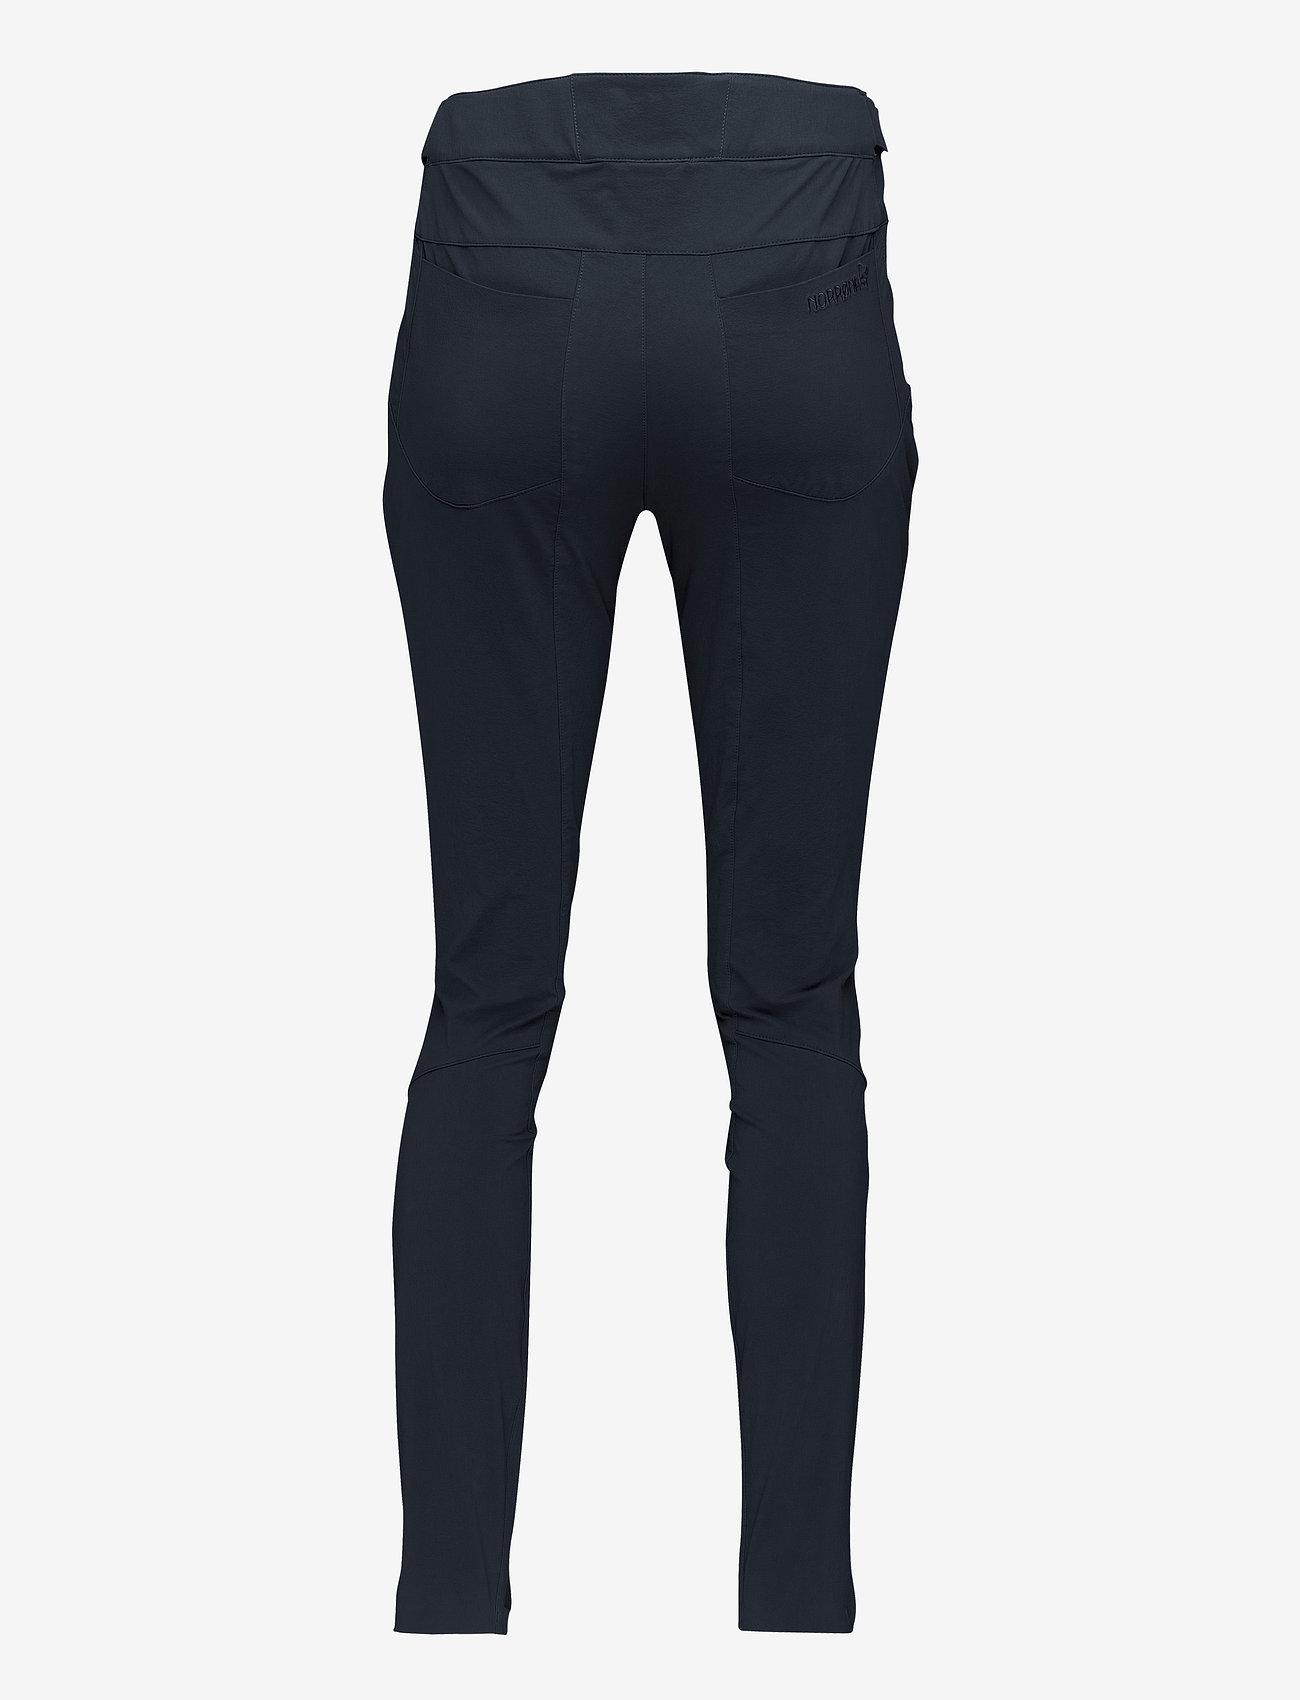 Norrøna - falketind flex1 slim Pants W's - friluftsbukser - caviar - 1